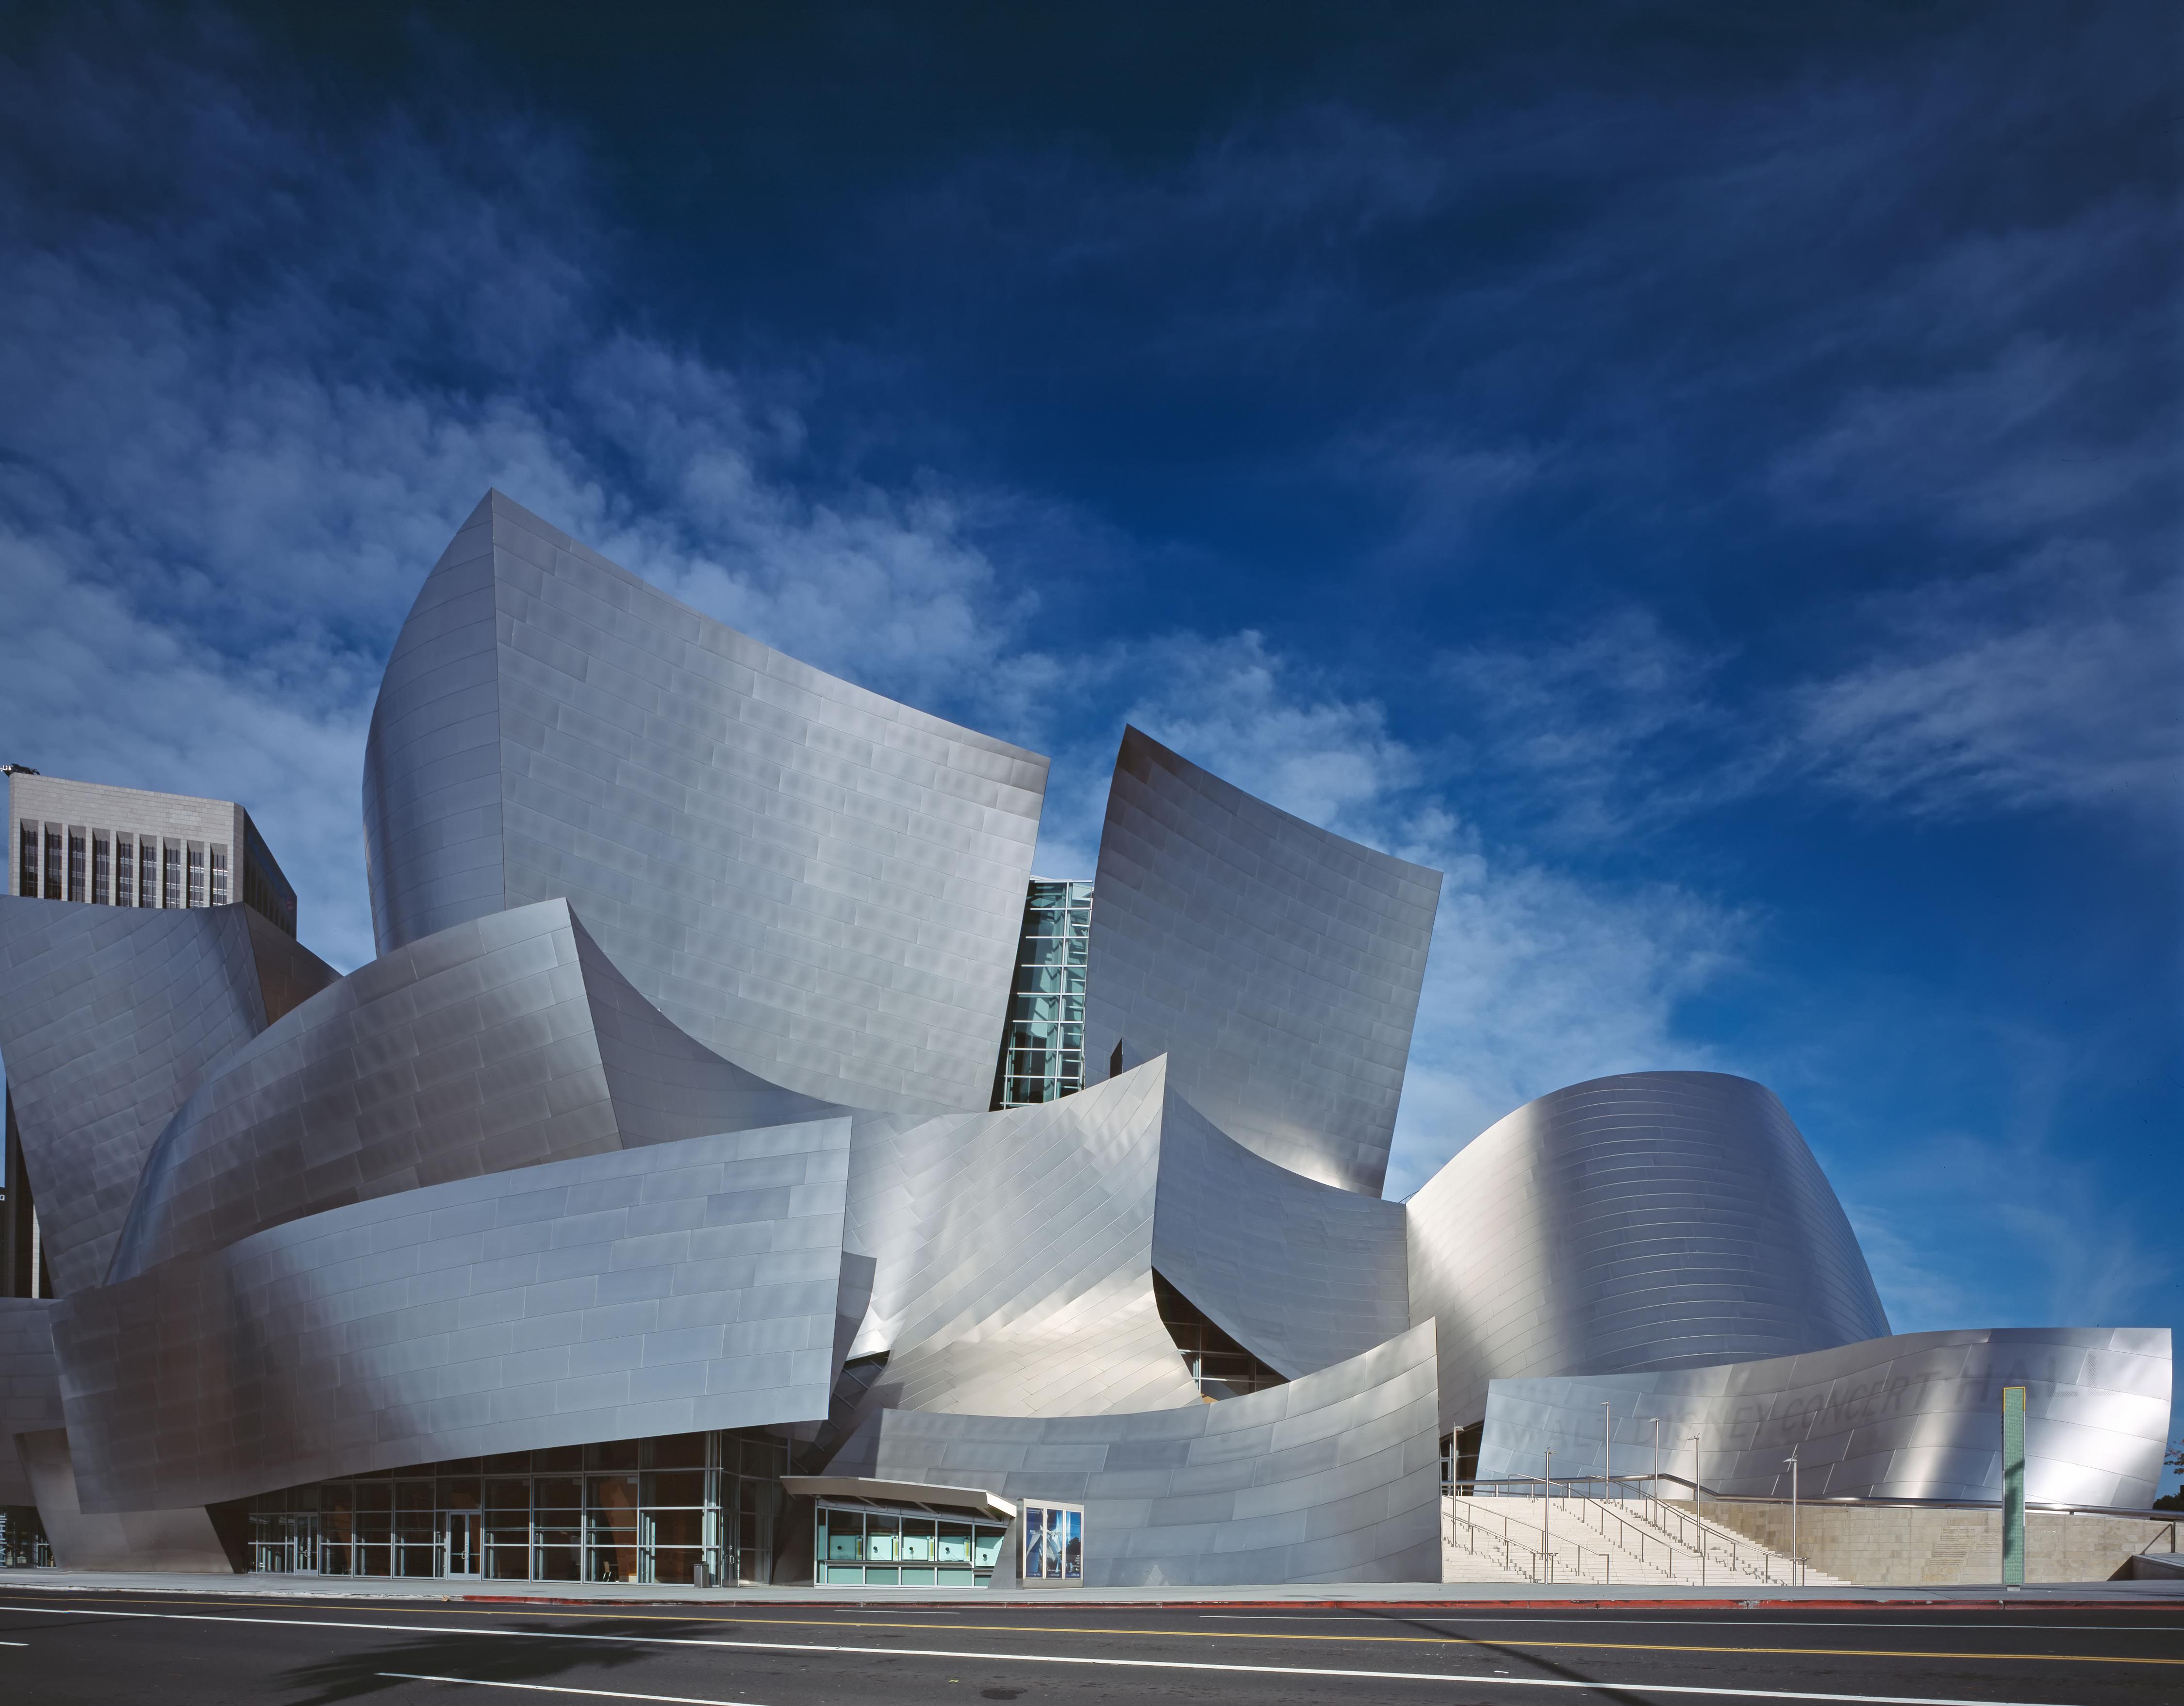 Trung tâm Hòa nhạc Walt Disney